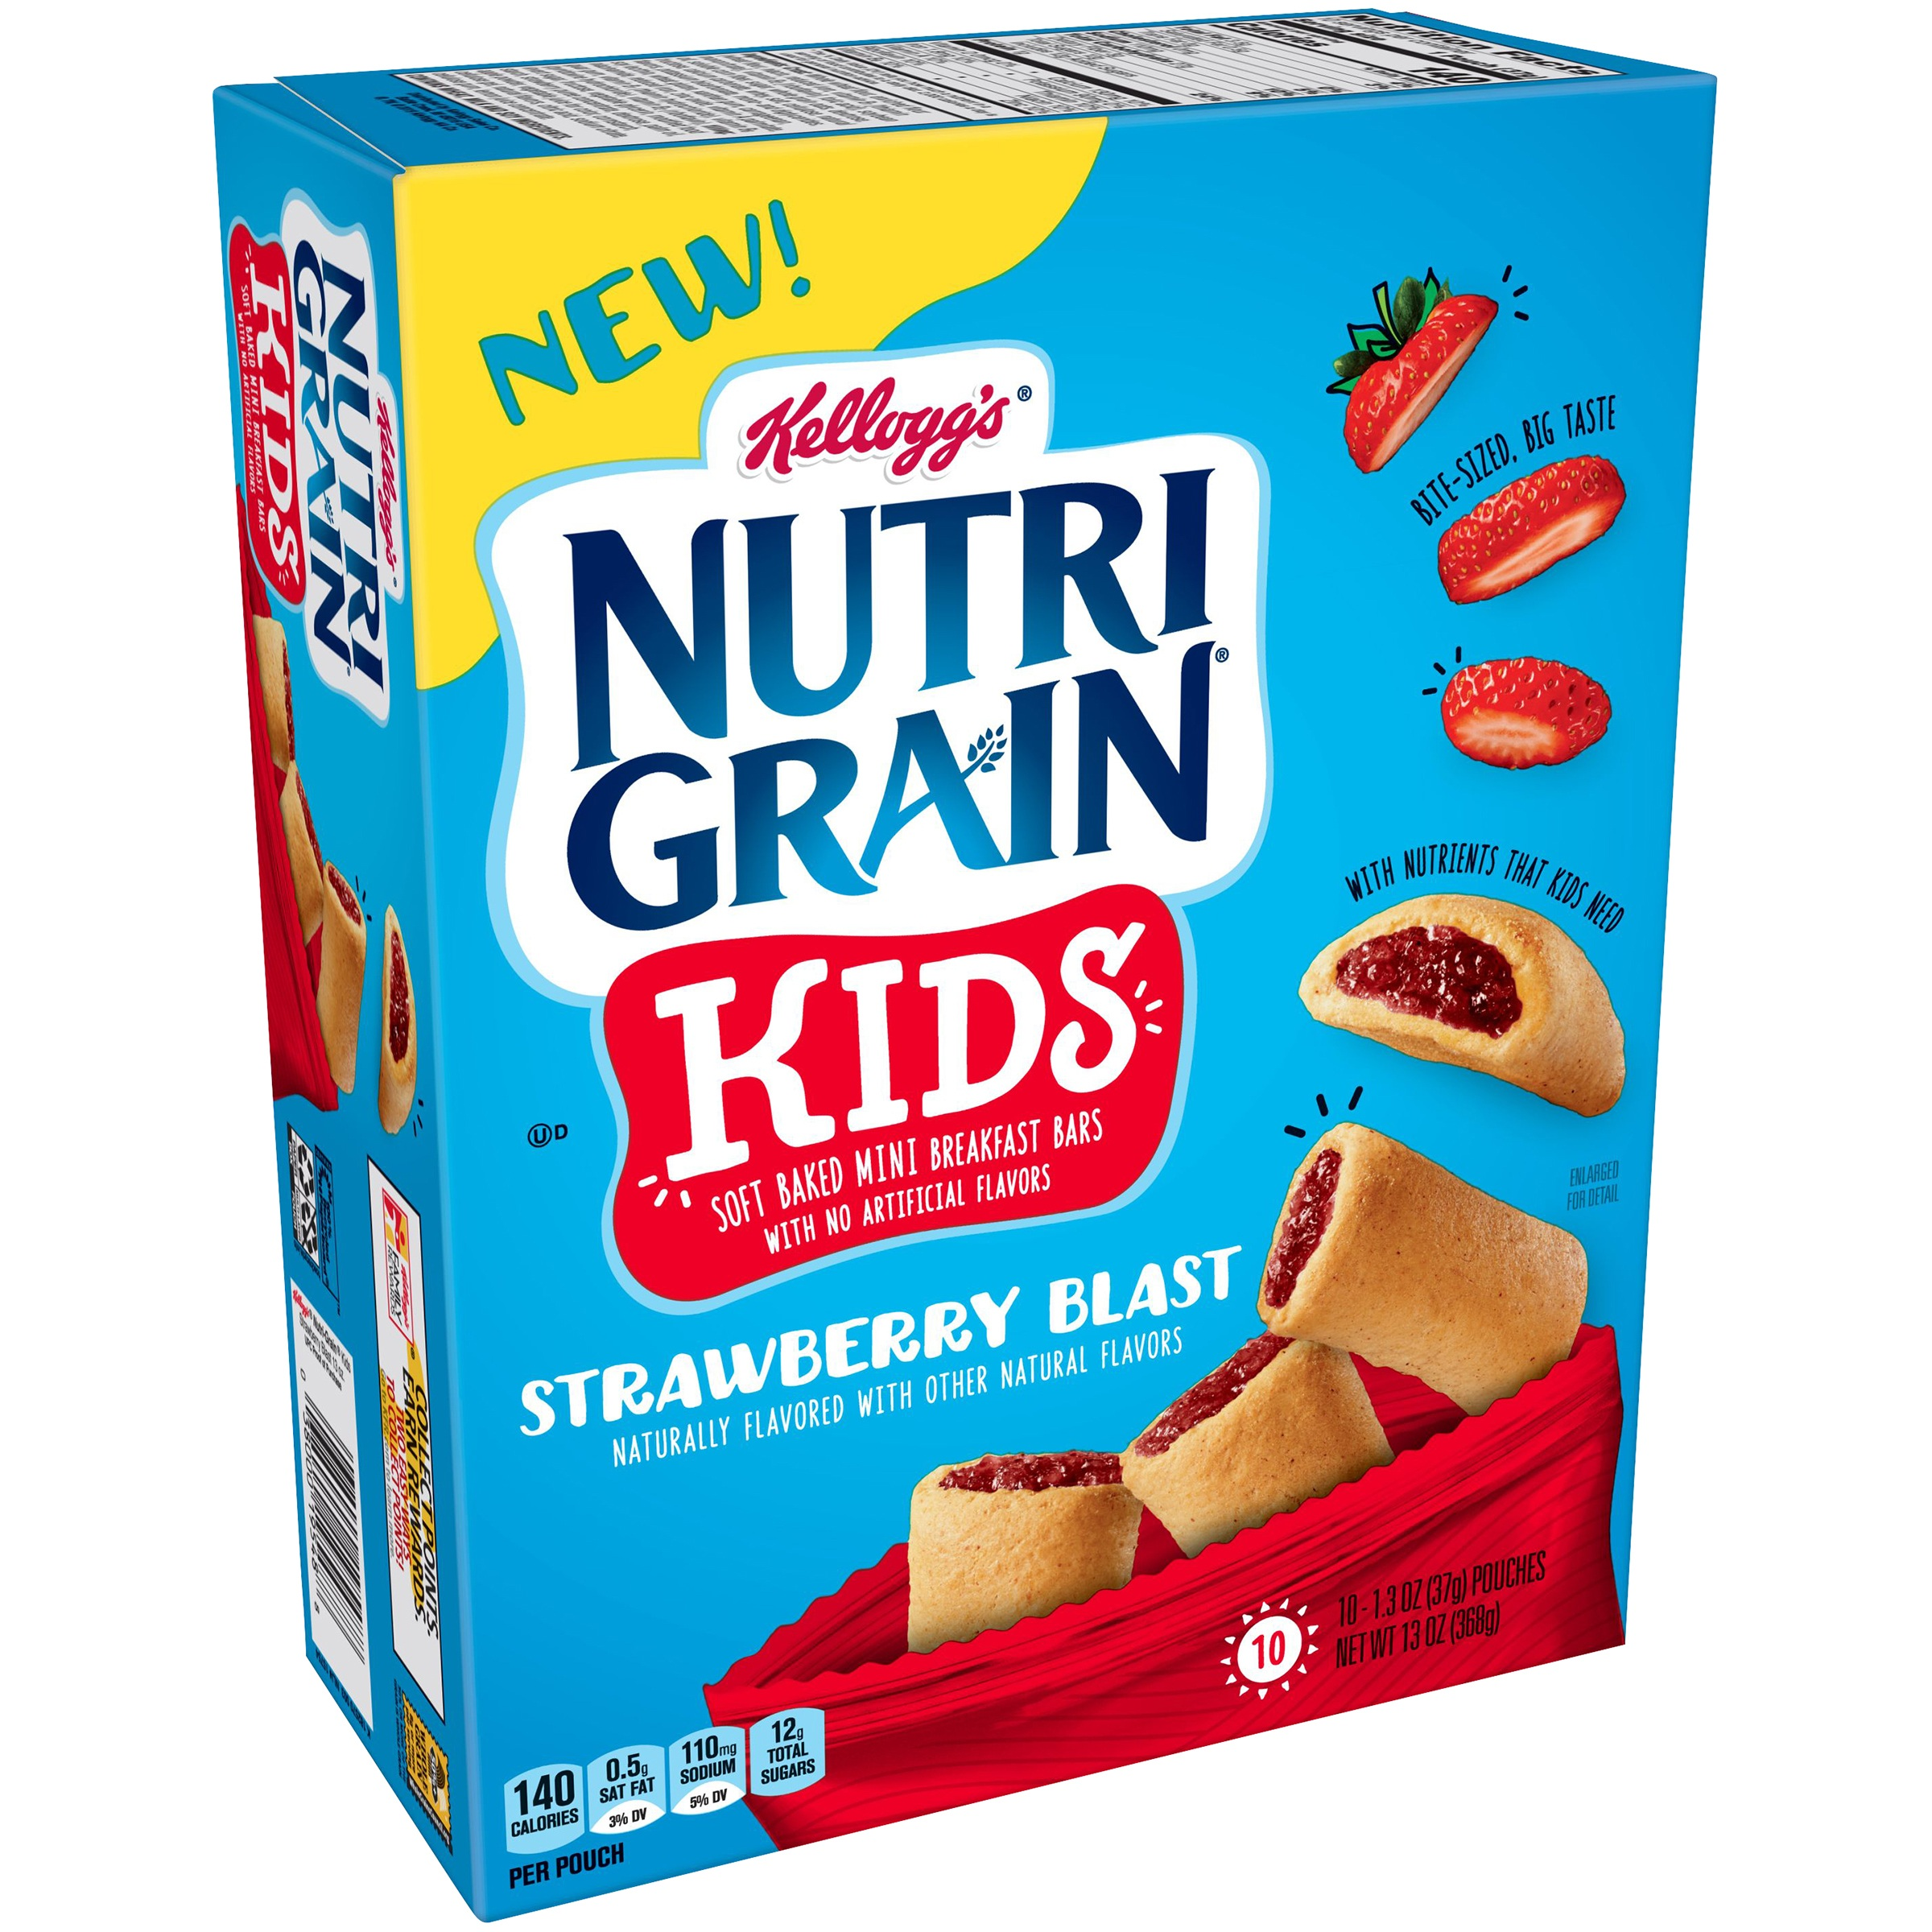 Kellogg's Nutri Grain Strawberry Bites Kids Mini Breakfast